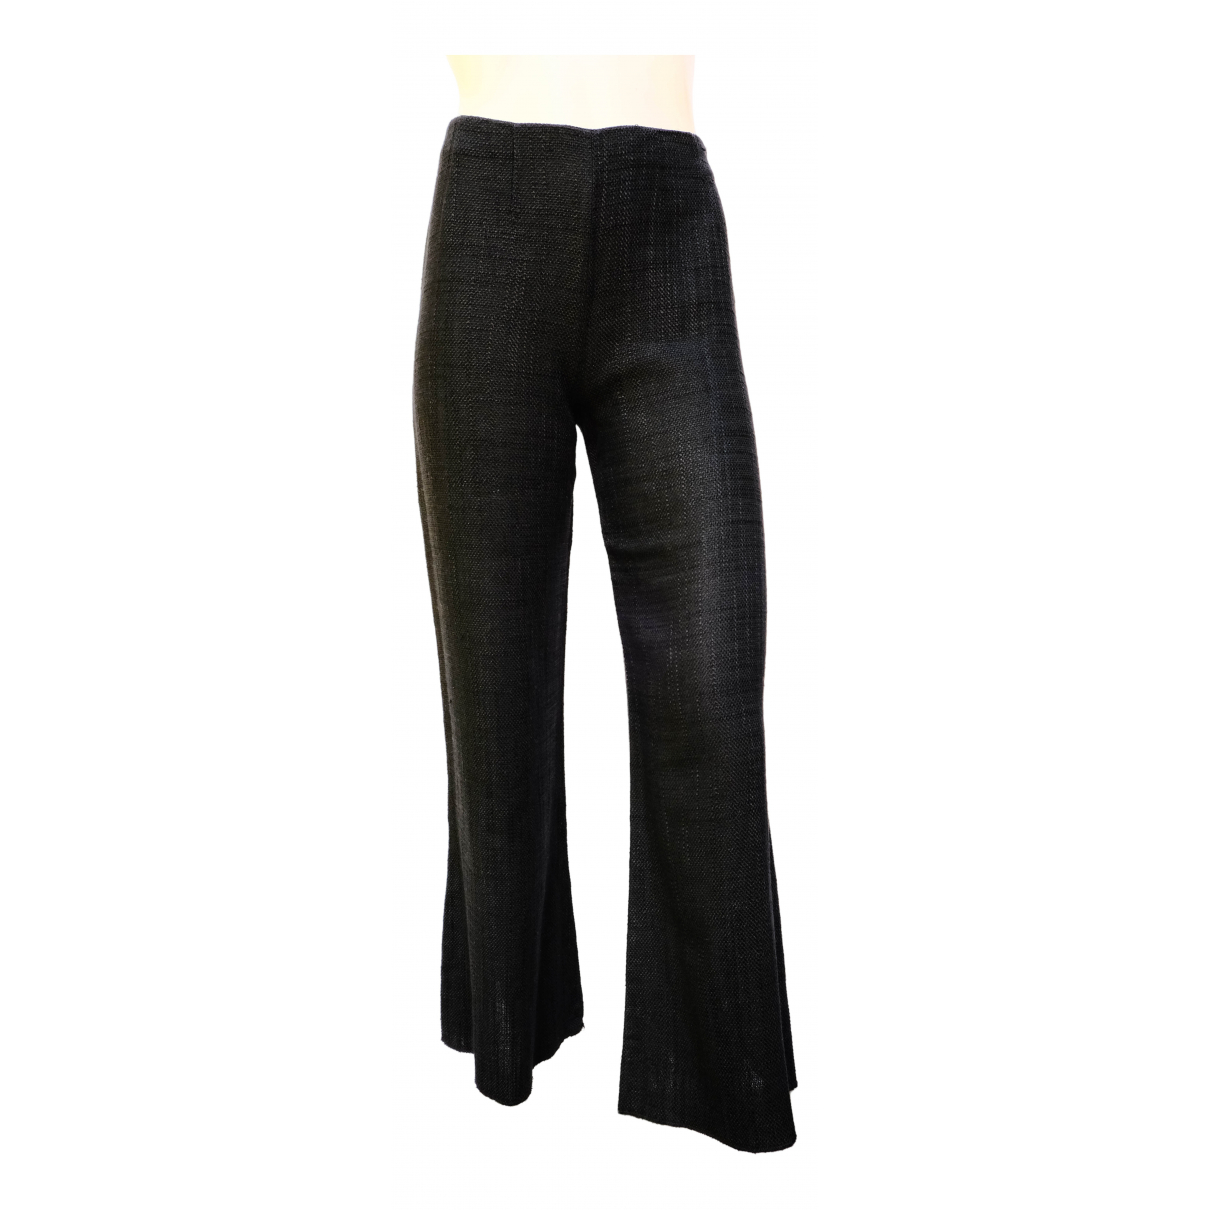 Valentino Garavani \N Black Wool Trousers for Women XS International